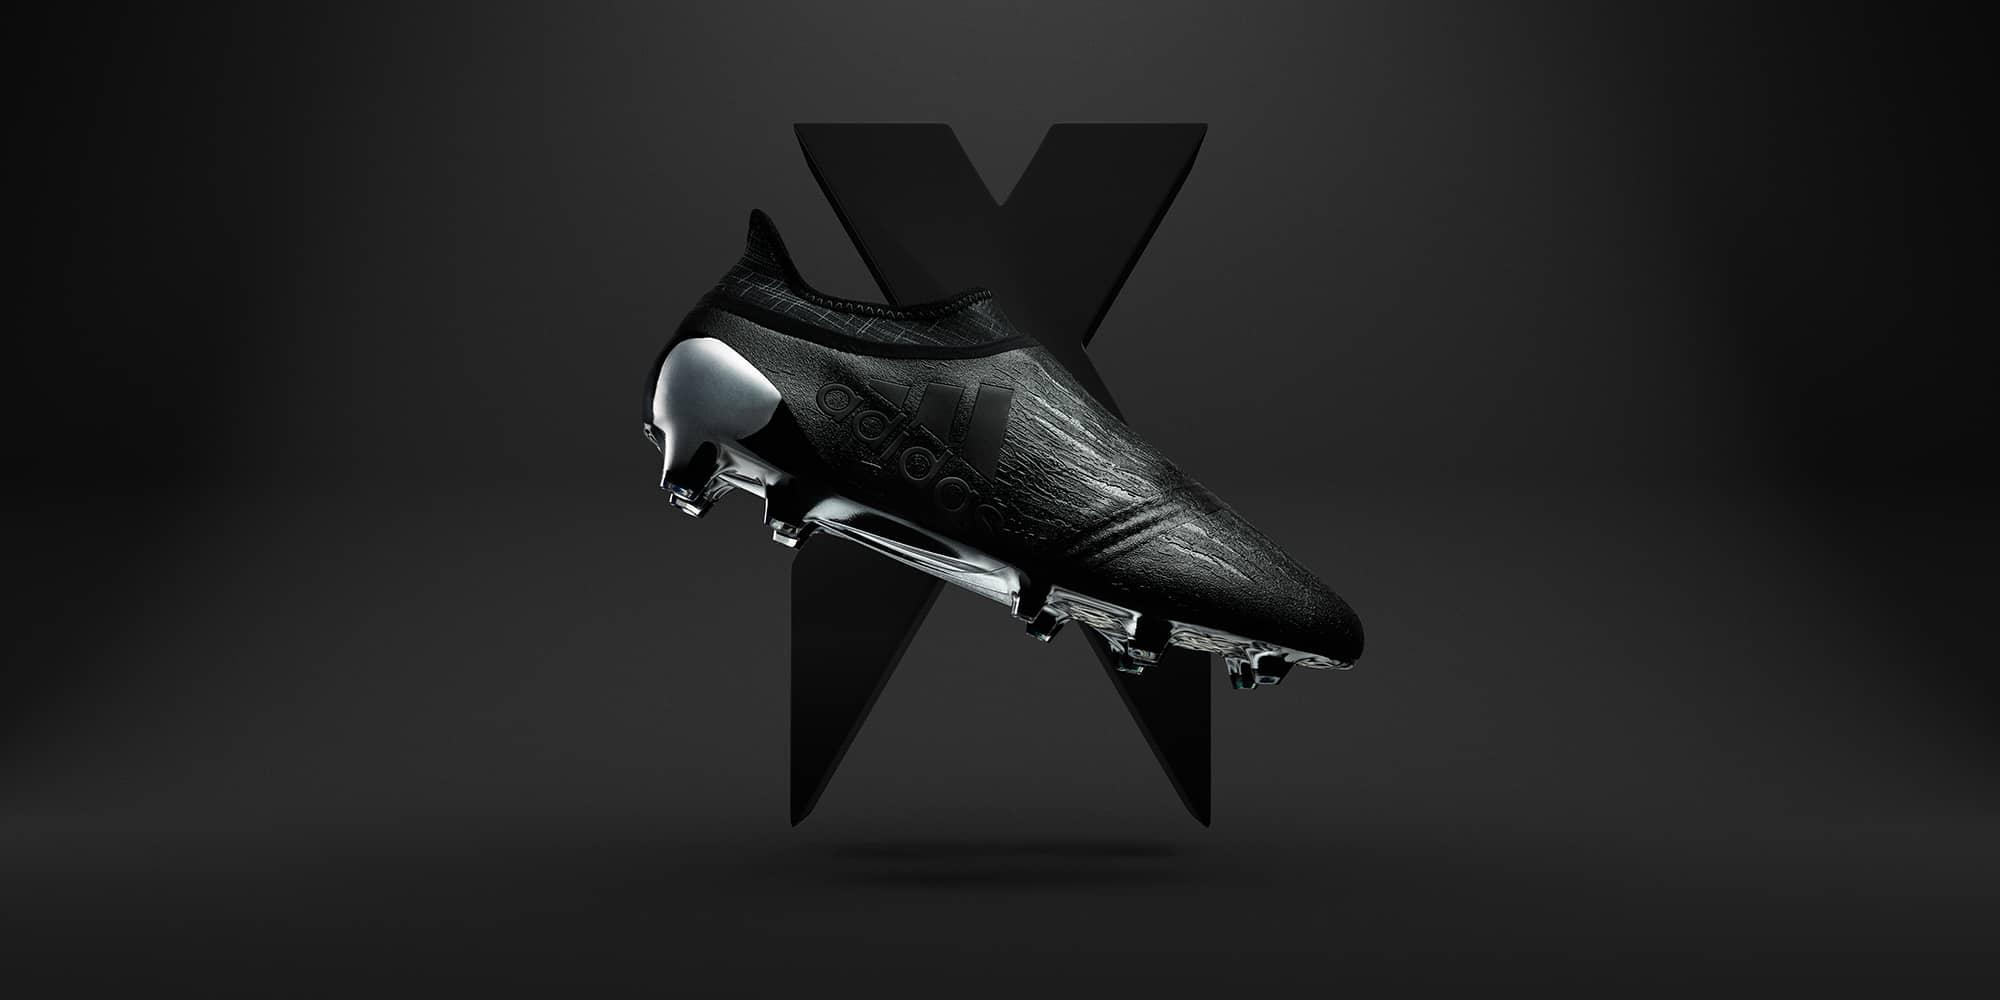 chaussure-football-adidas-X16-purechaos-darkspace-aout-2016